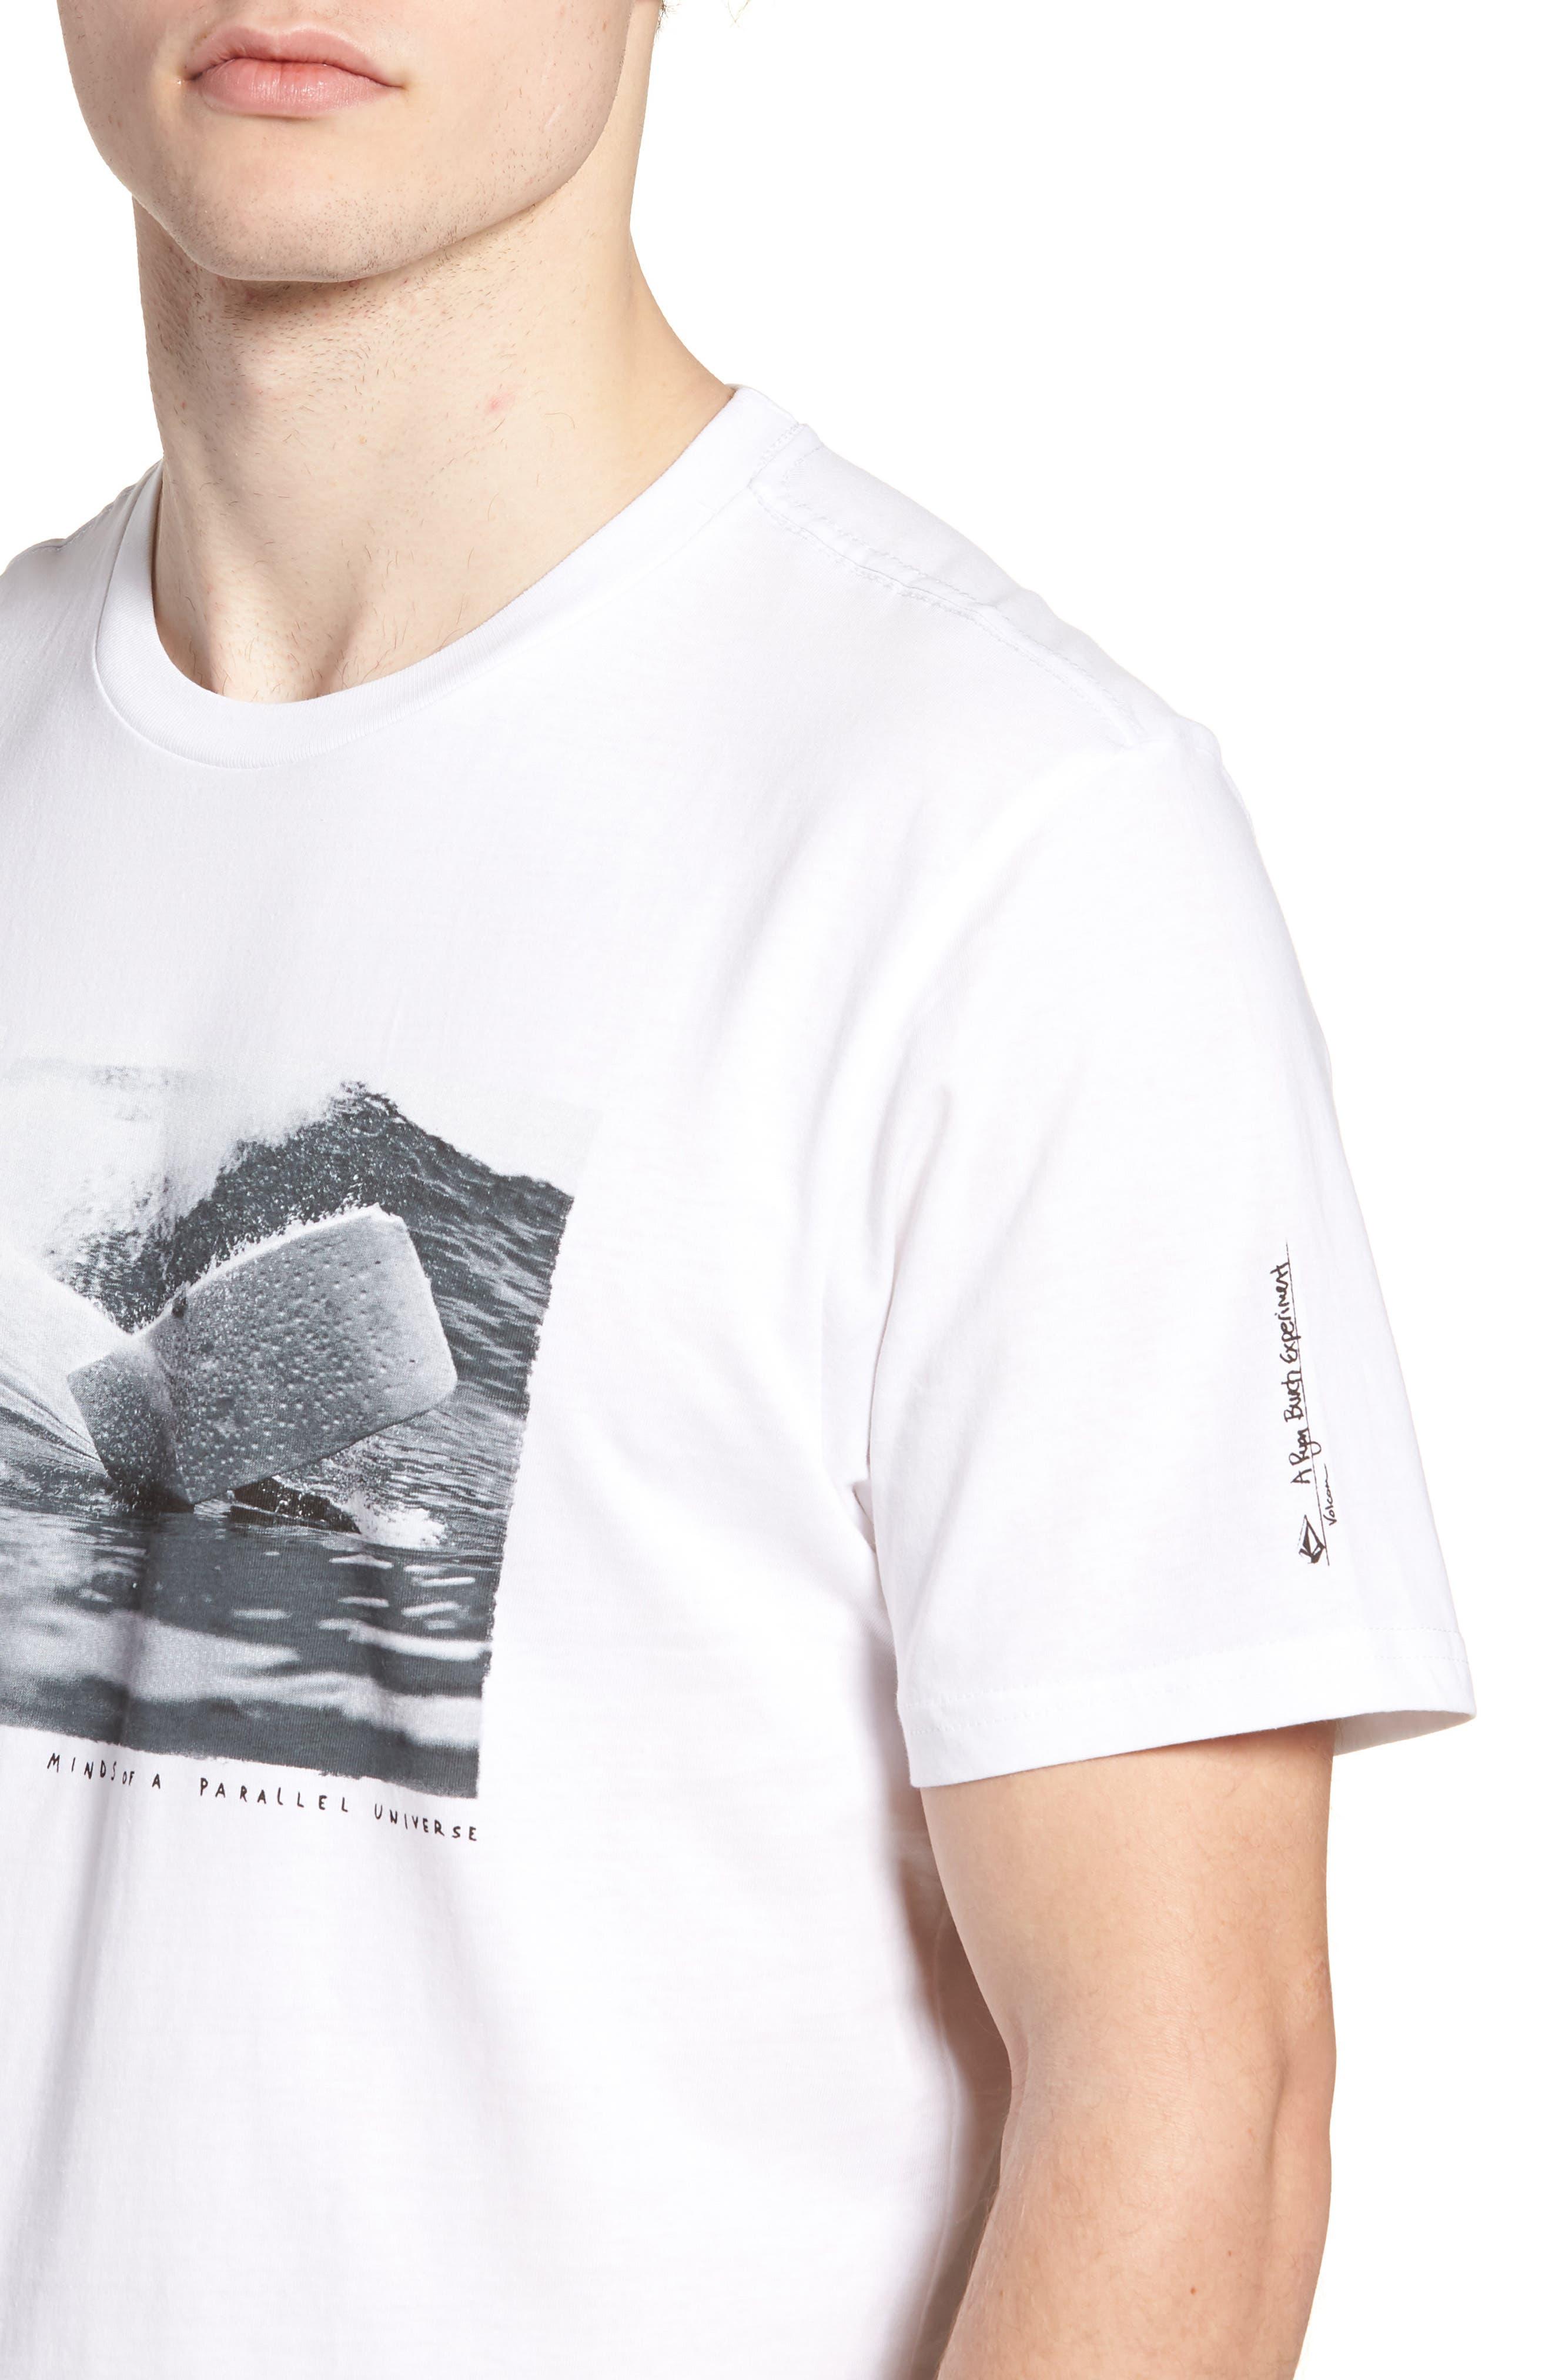 Burch Foam Graphic T-Shirt,                             Alternate thumbnail 4, color,                             White